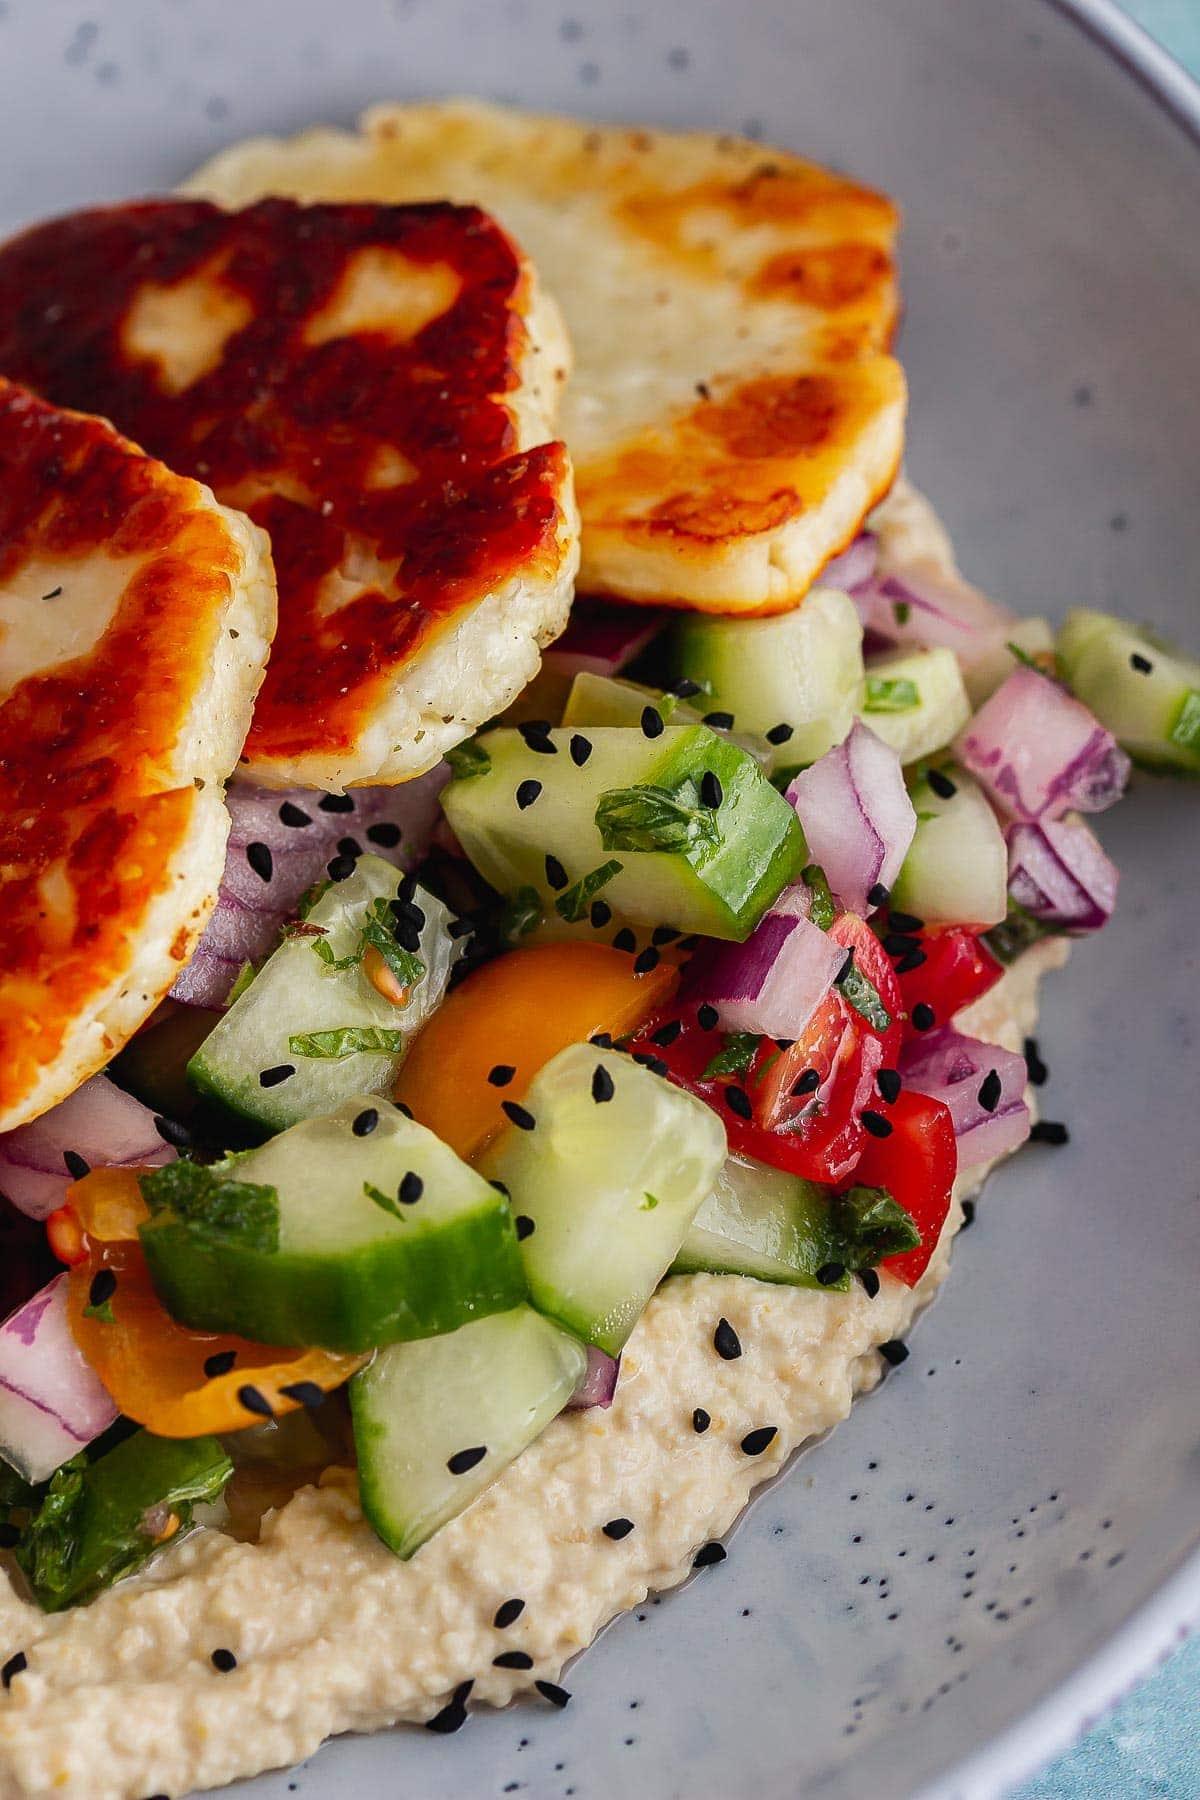 Close up of halloumi and salad on hummus